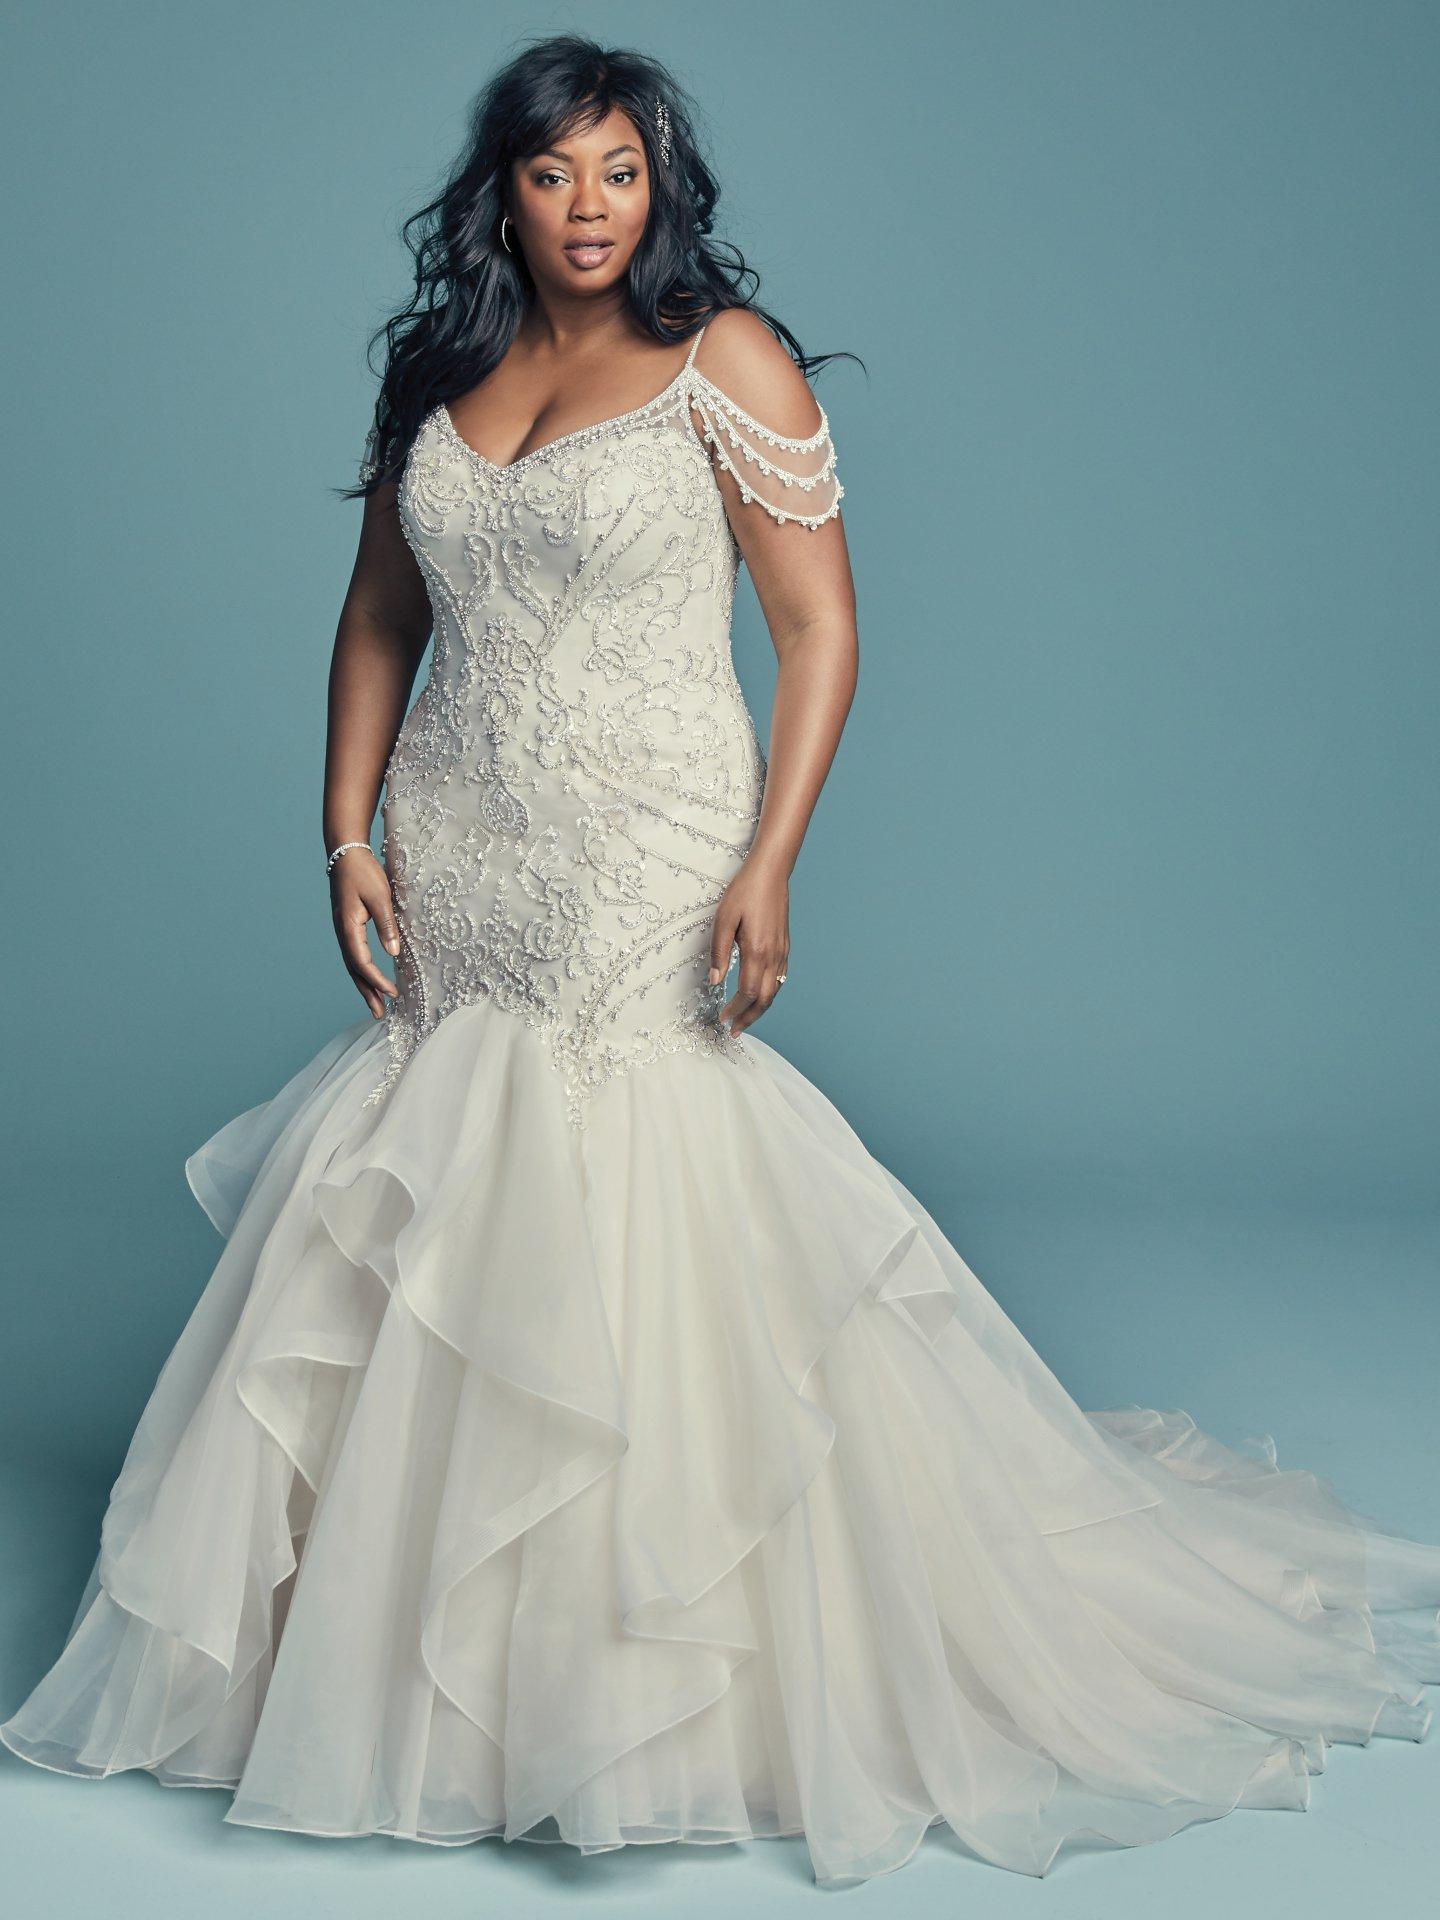 Cold Shoulder Sweetheart Neckline Beaded Bodice Organza Skirt Mermaid Wedding Dress Kleinfeld Bridal